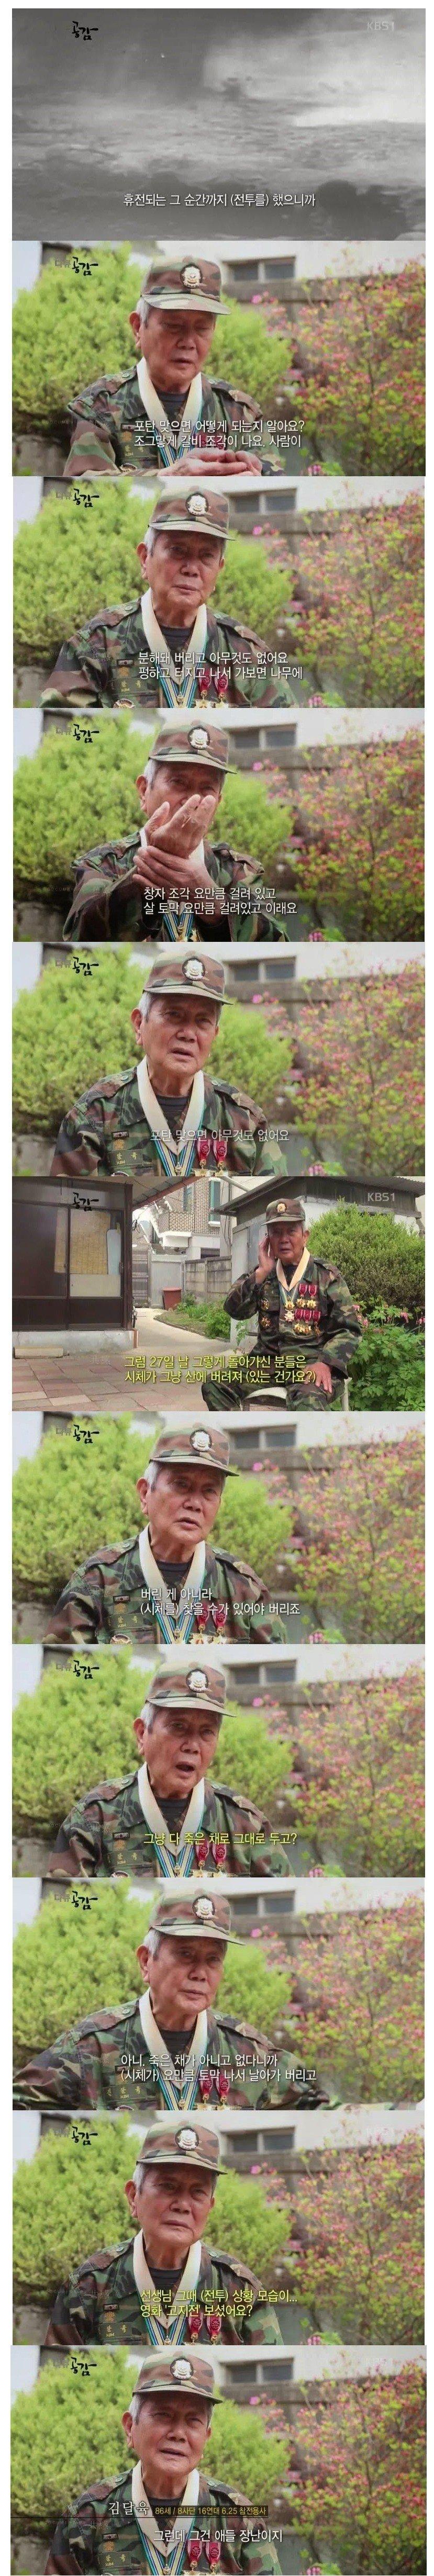 53B365184A54420002.jpg 한국전쟁 참전자가 증언하는 전쟁의 공포